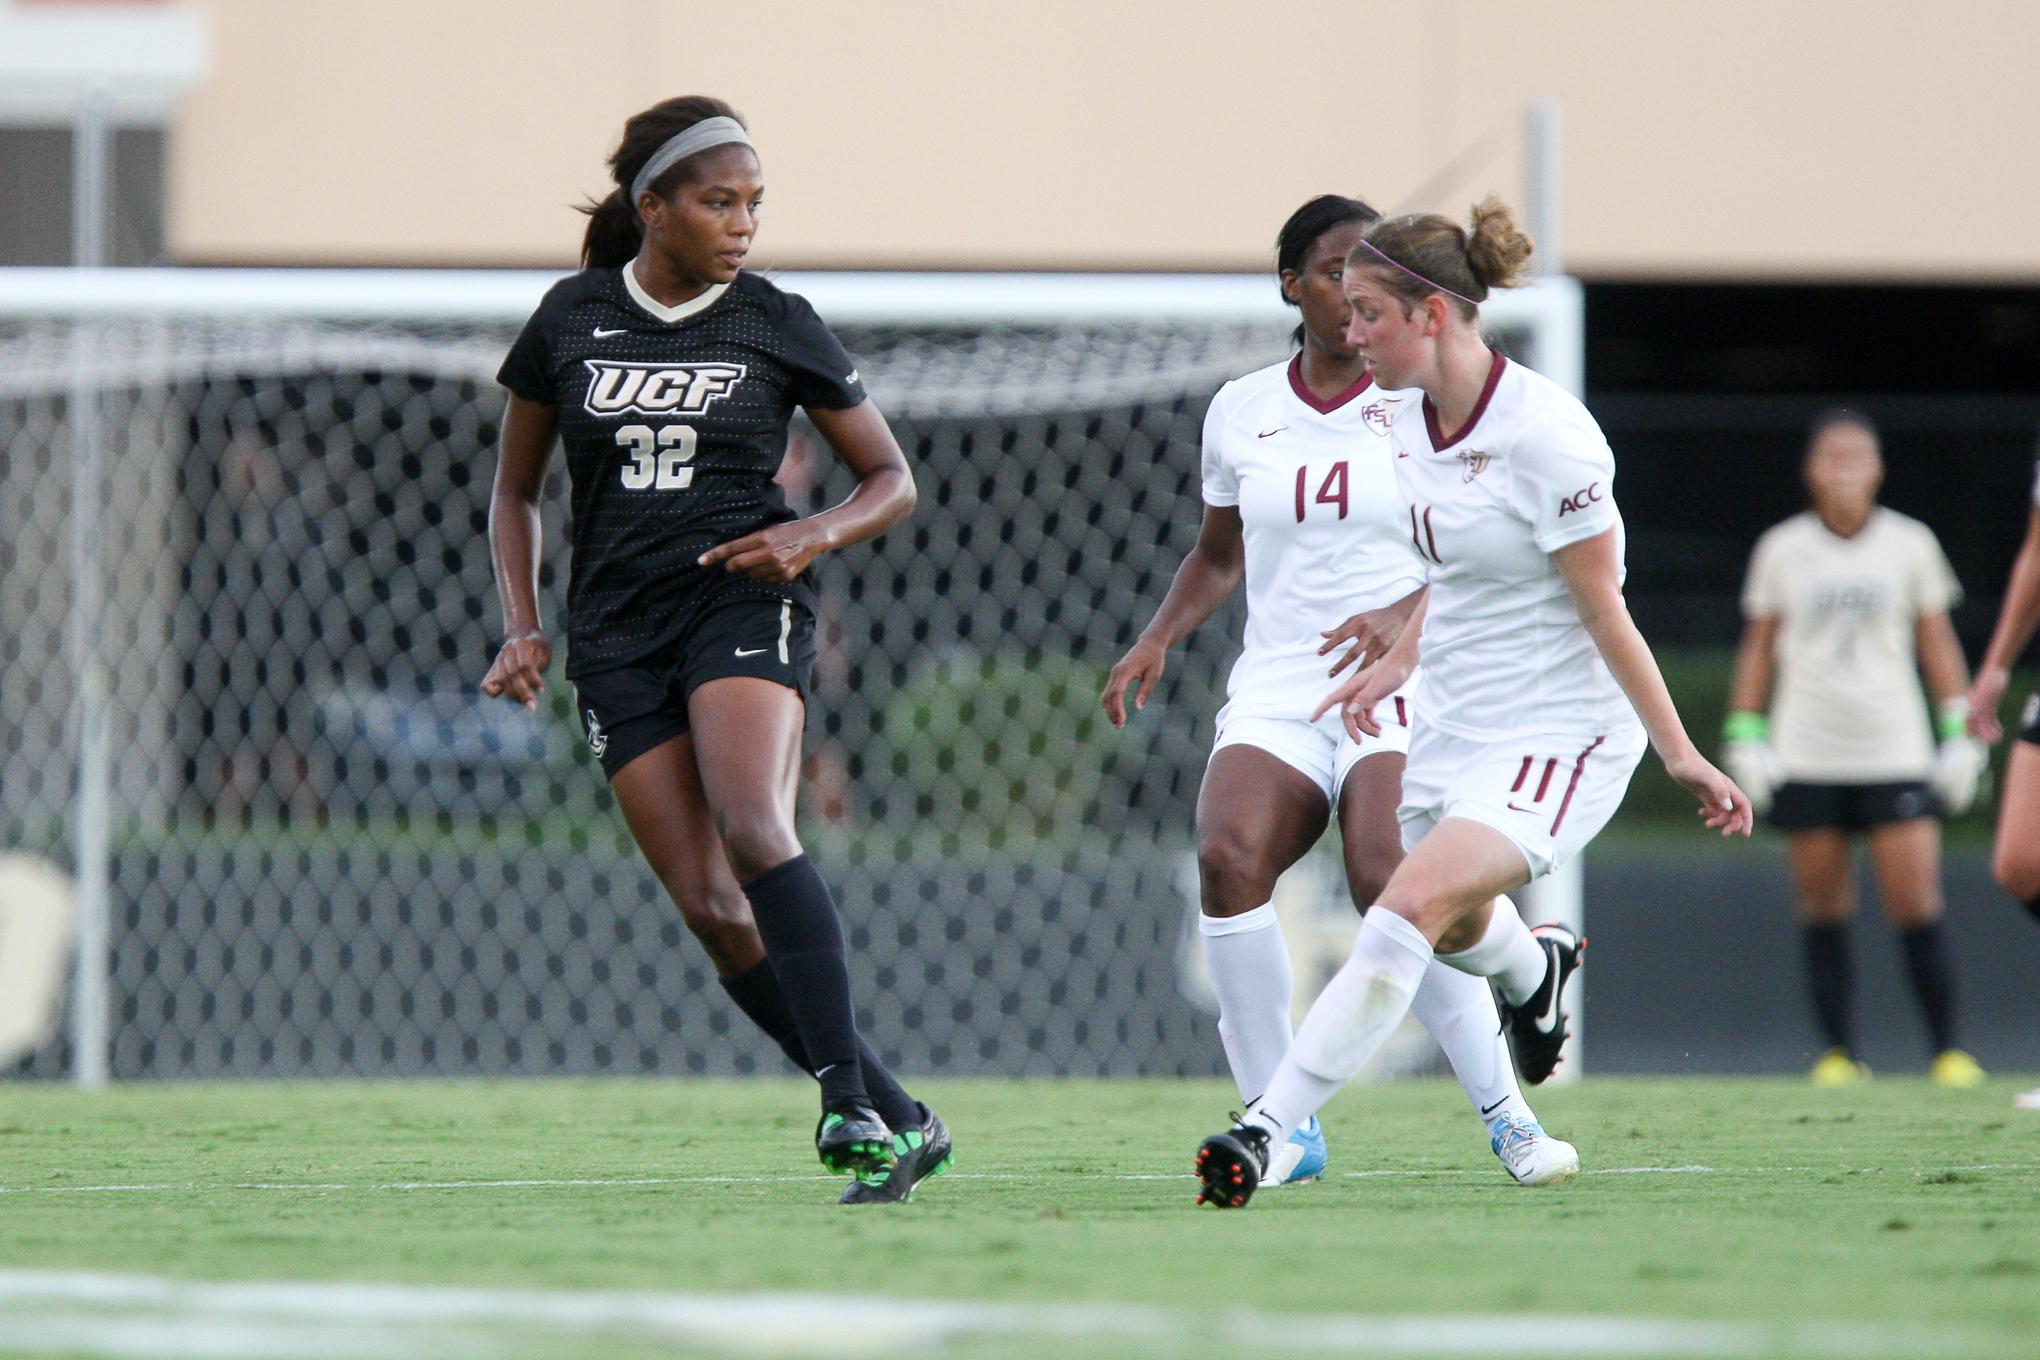 Defender Marissa Diggs Takes on FSU players.